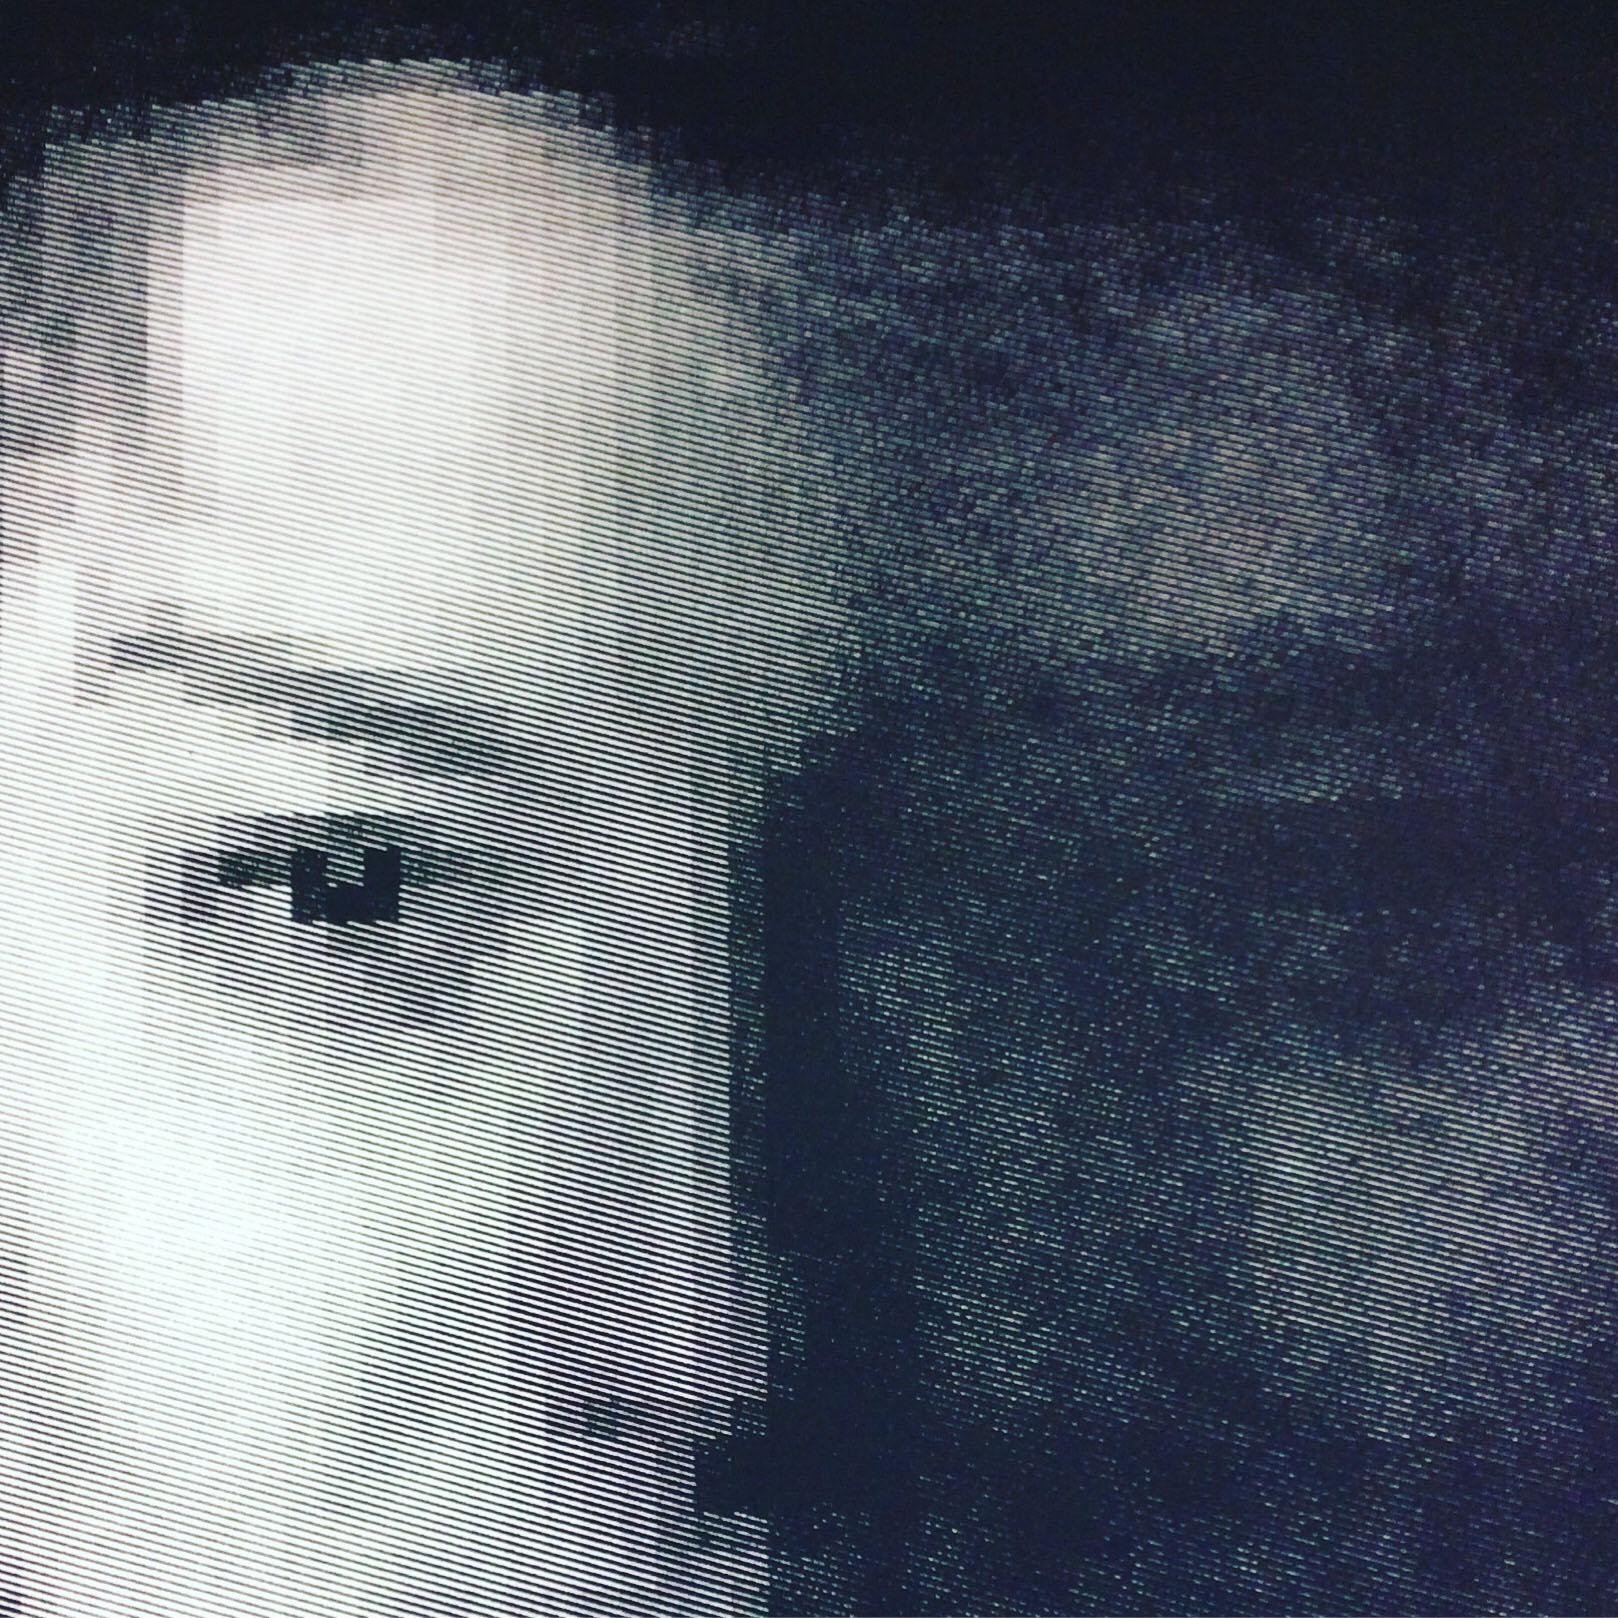 Artistic-and-Autistic-Screen-Print-Jane-Elizabeth-Bennett